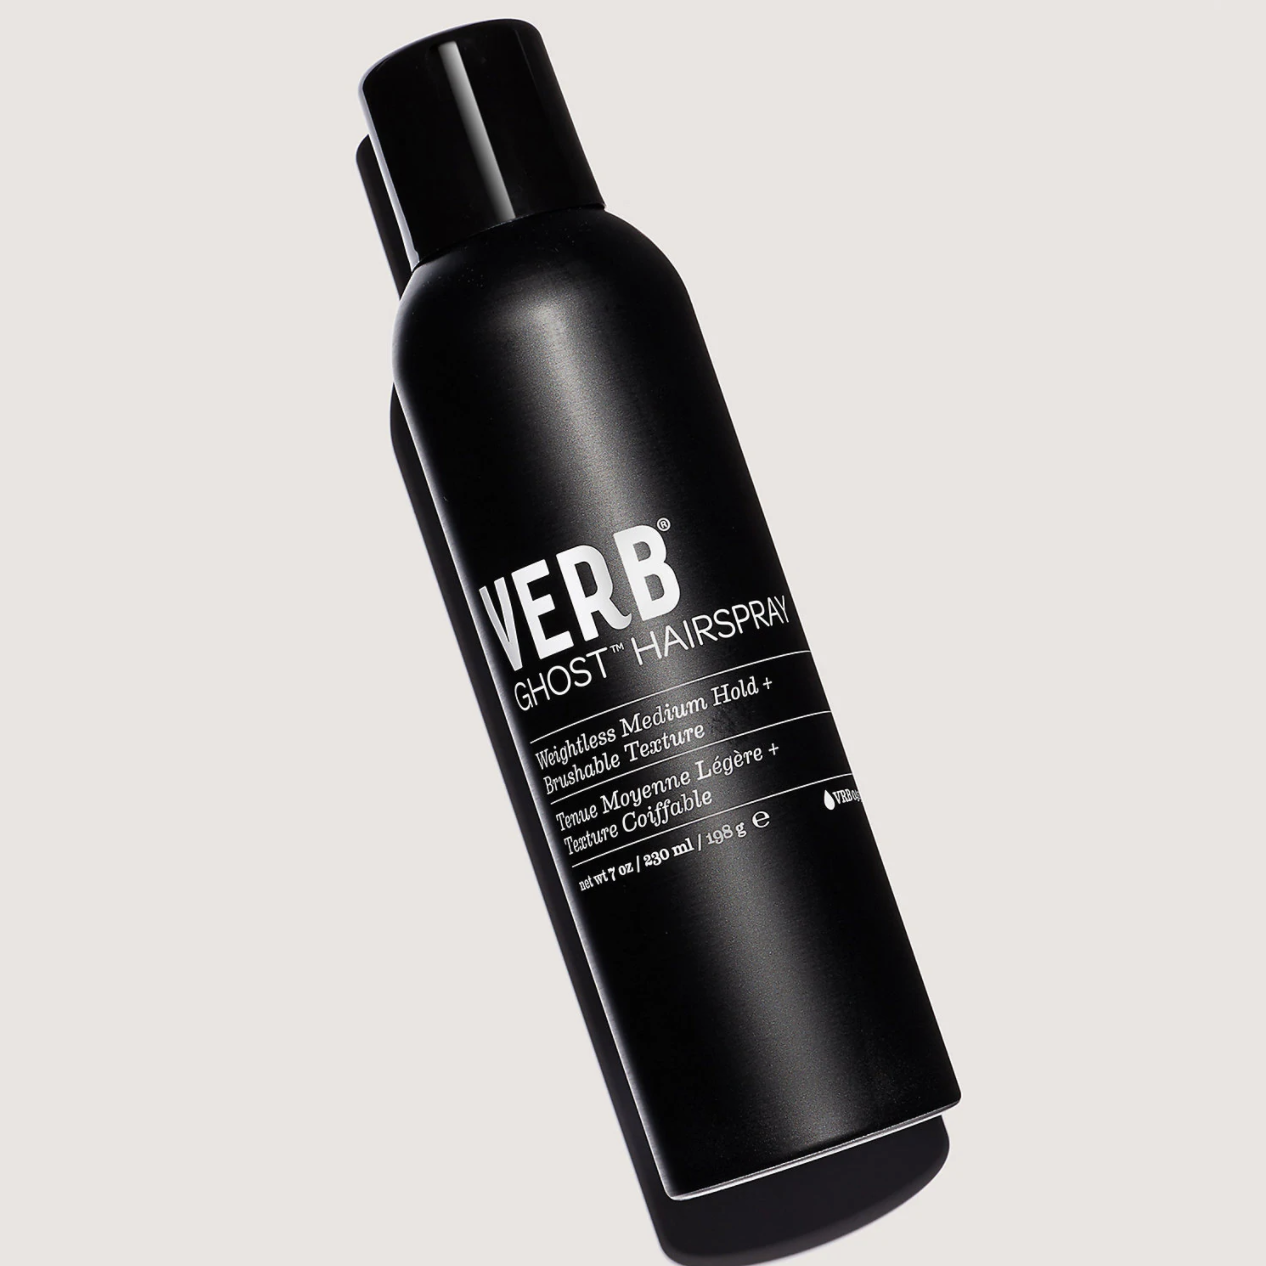 The hairspray bottle